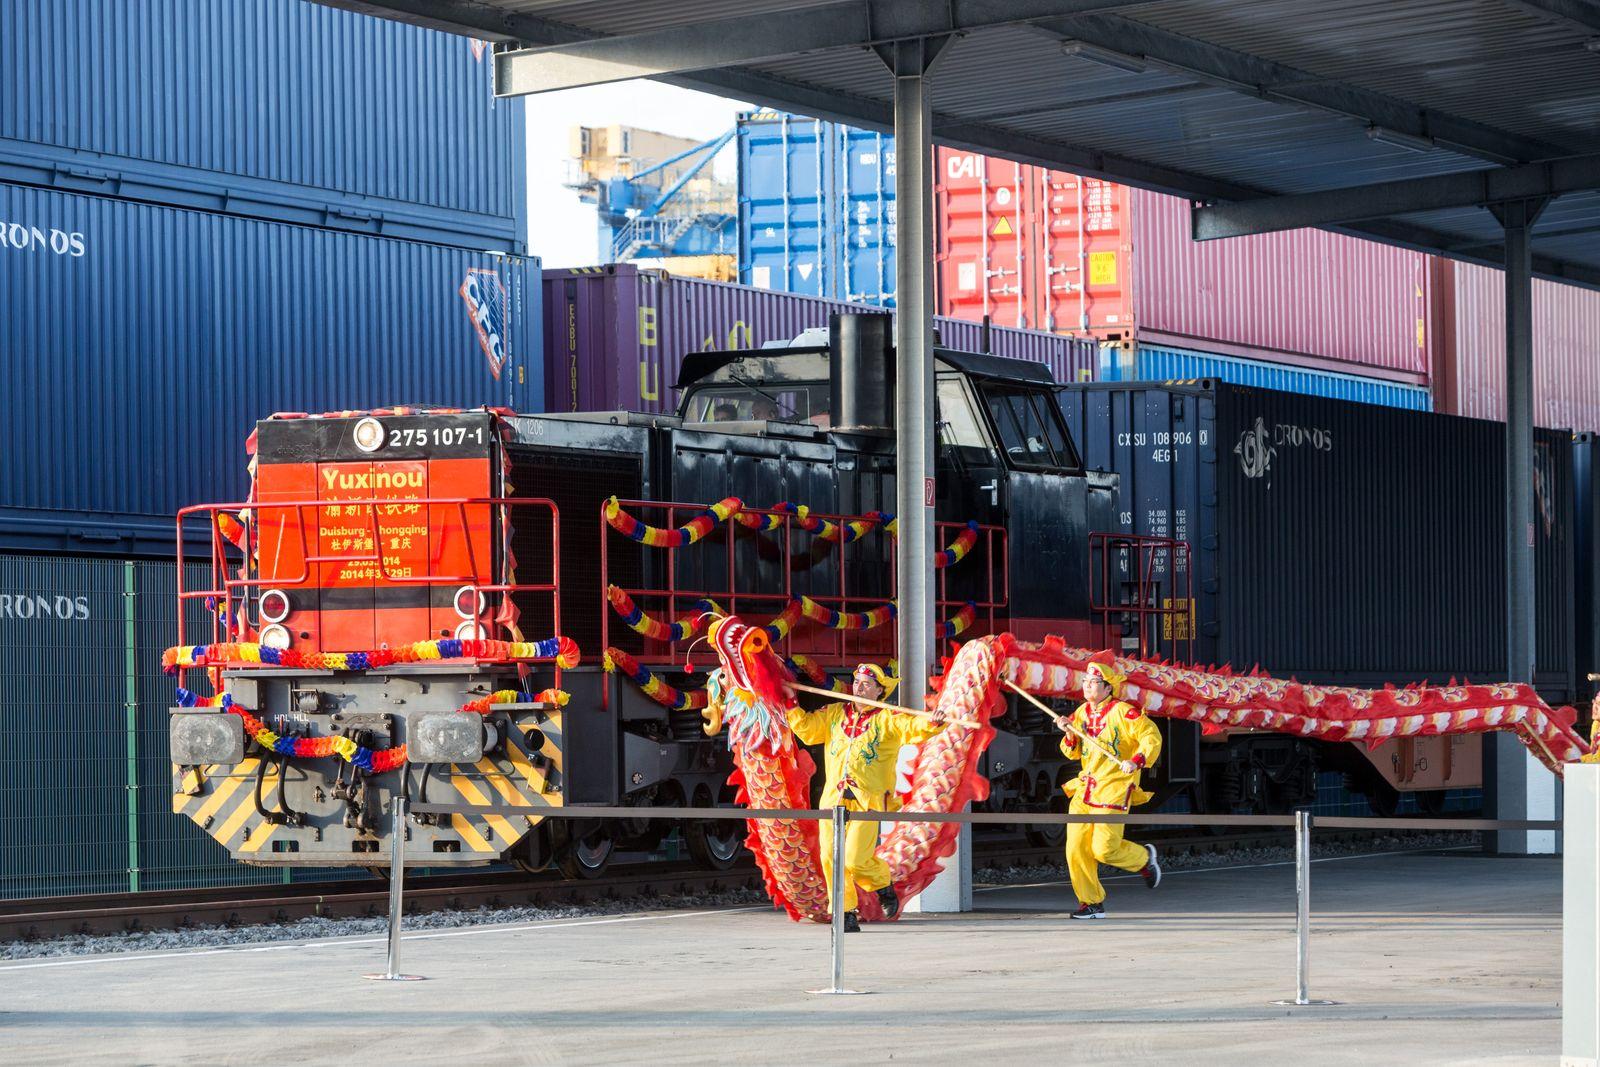 Yuxinou / Güterzug China Deutschland